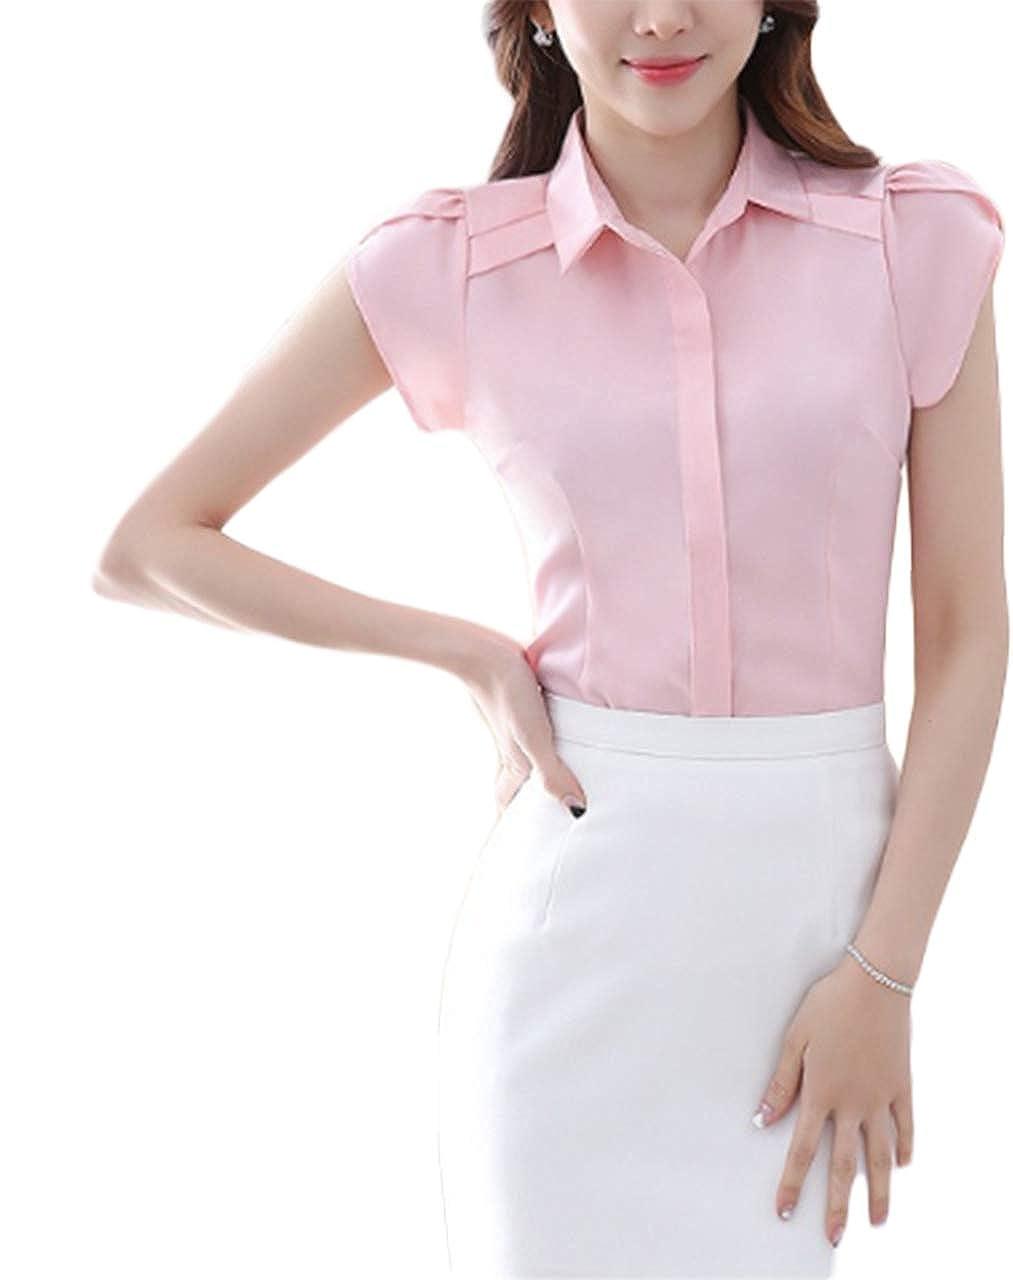 3bd798f3f773 Womens Cotton Half Sleeve Button Up Shirt - DREAMWORKS